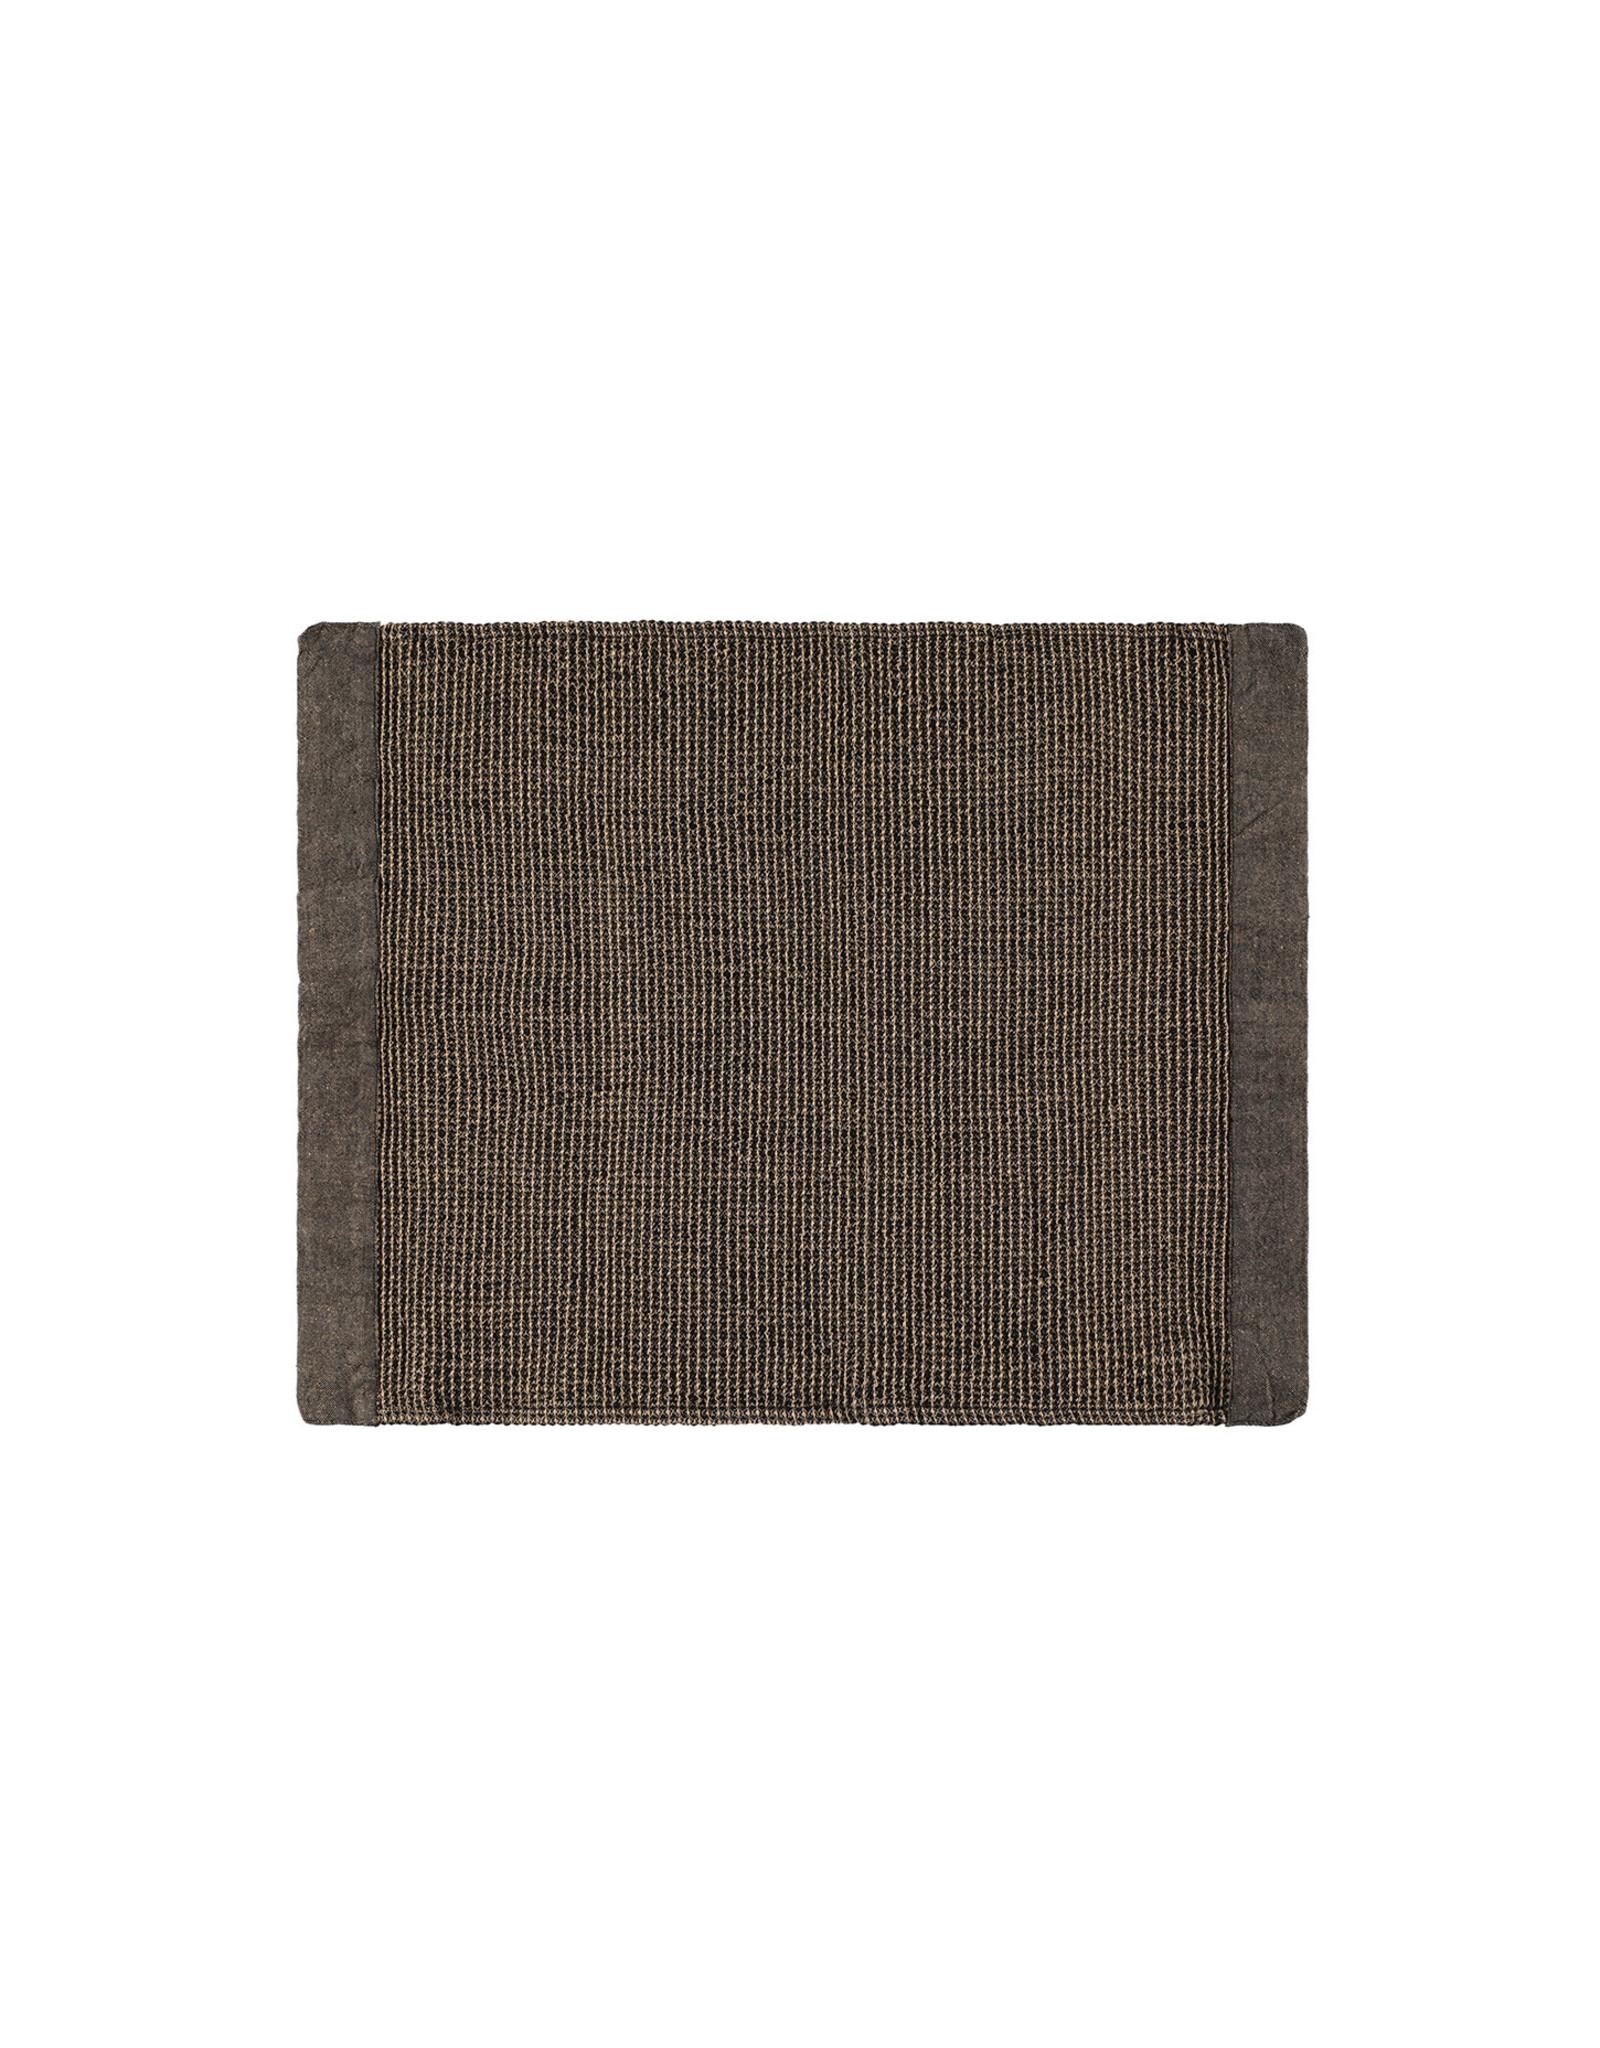 Rento Rento KENNO Linen Seat Cover